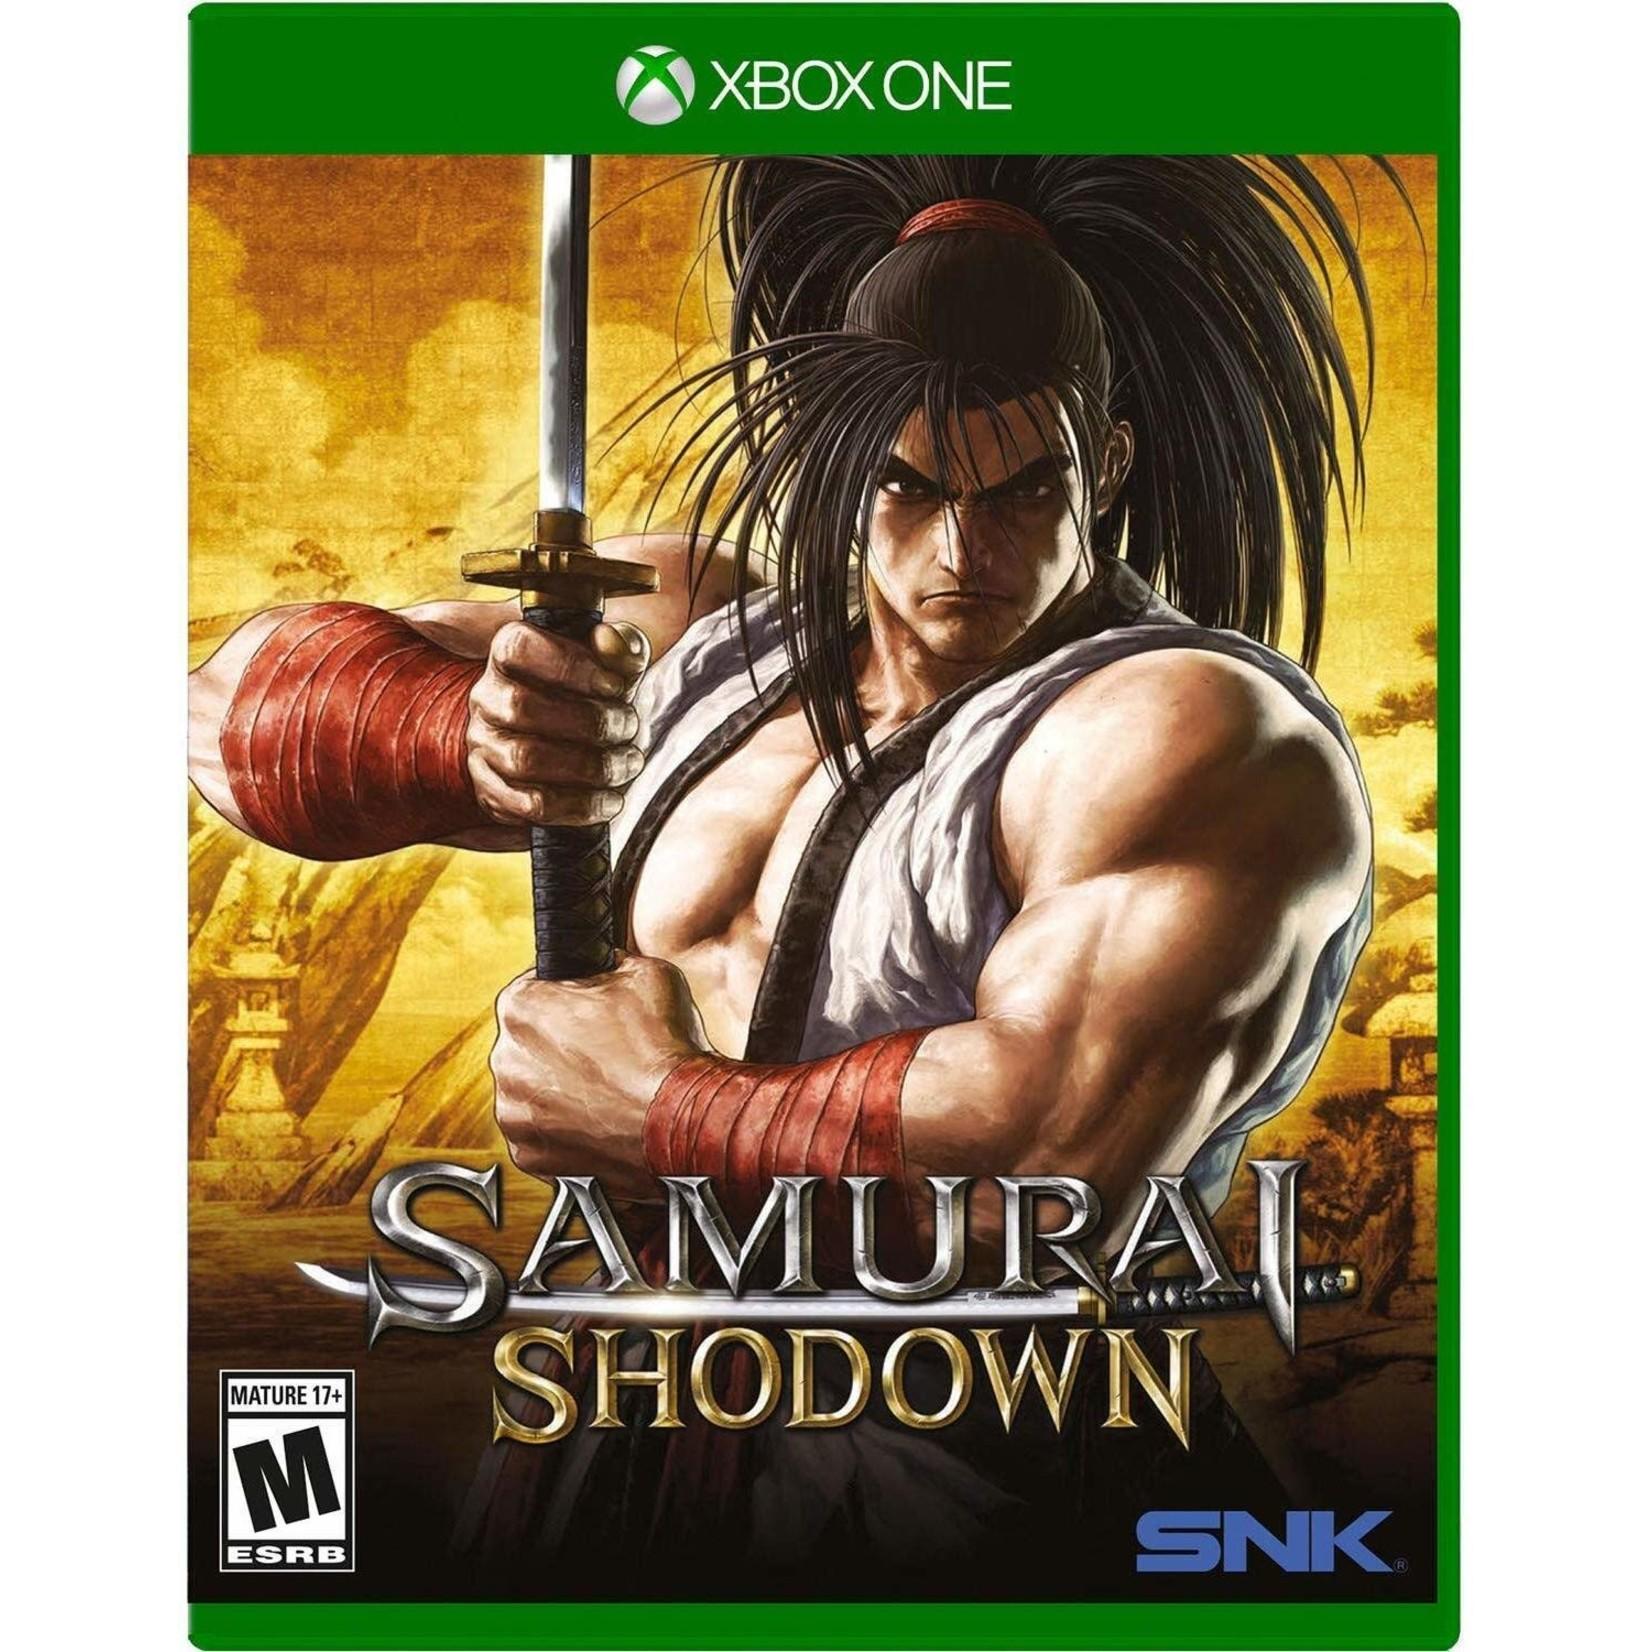 XB1U-Samurai Shodown